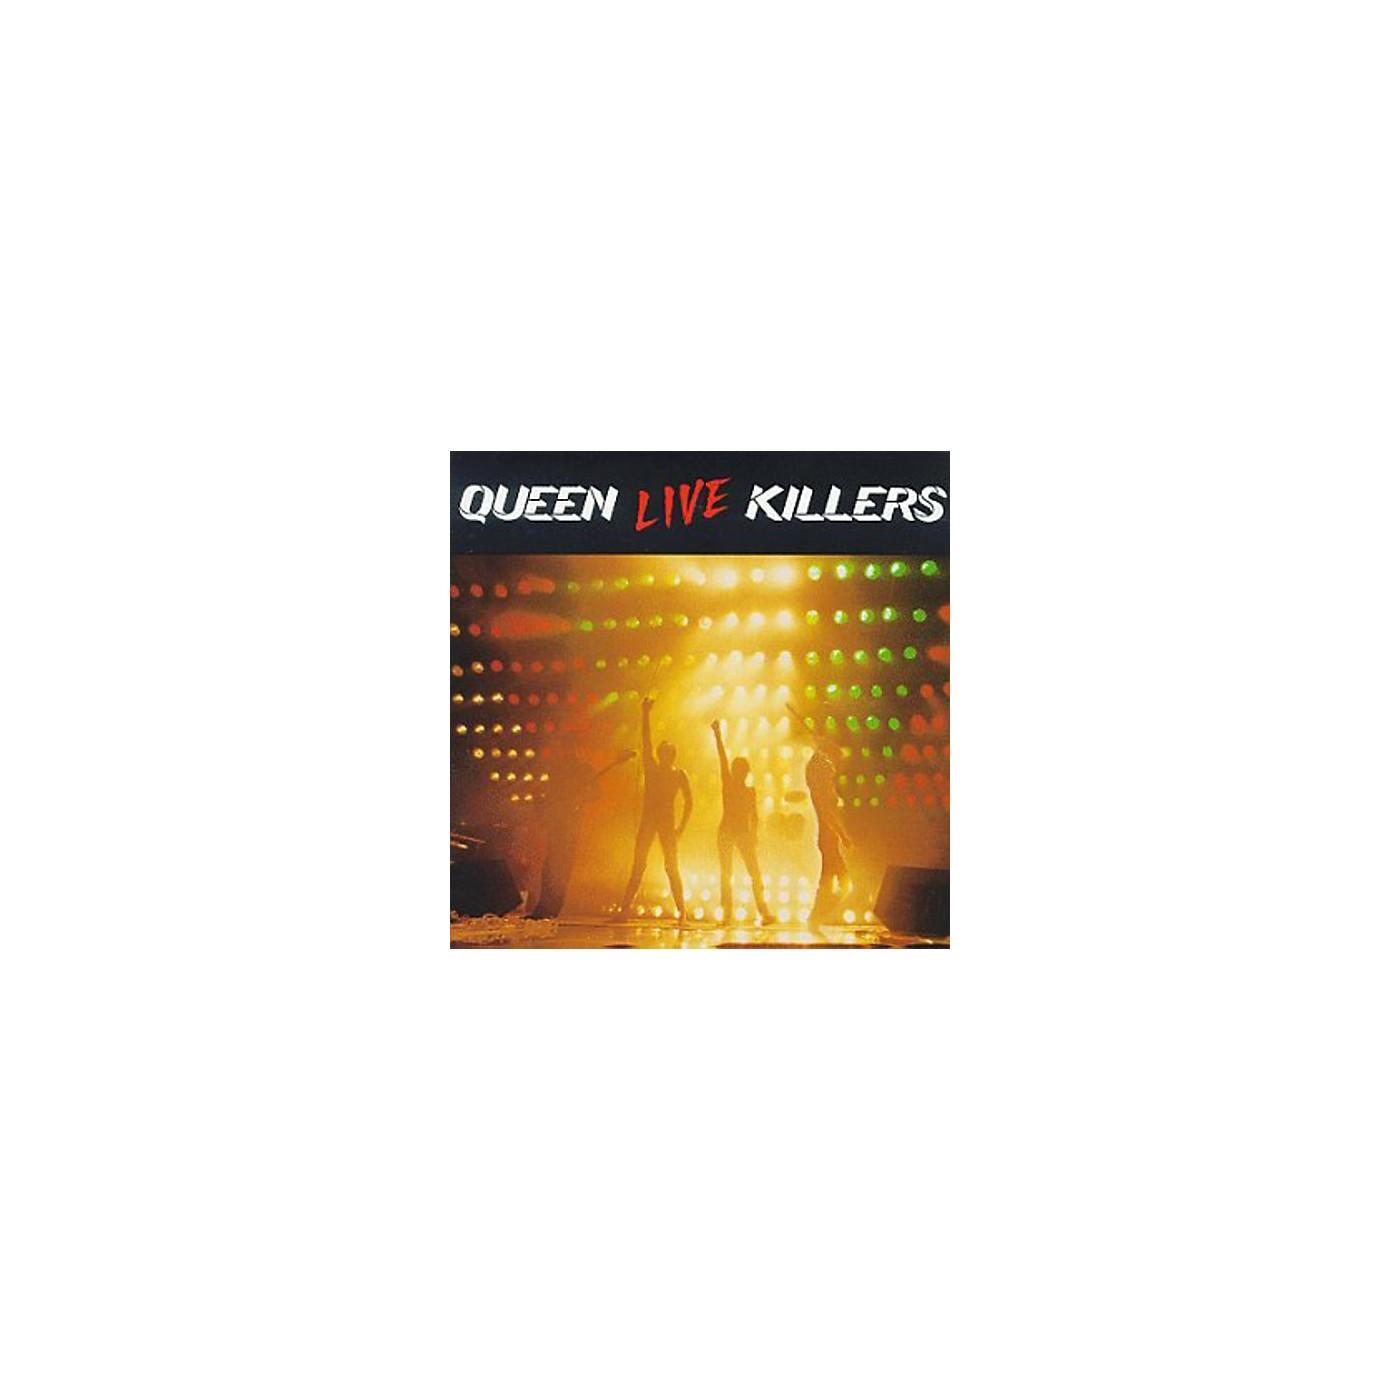 Alliance Queen - Live Killers (CD) thumbnail